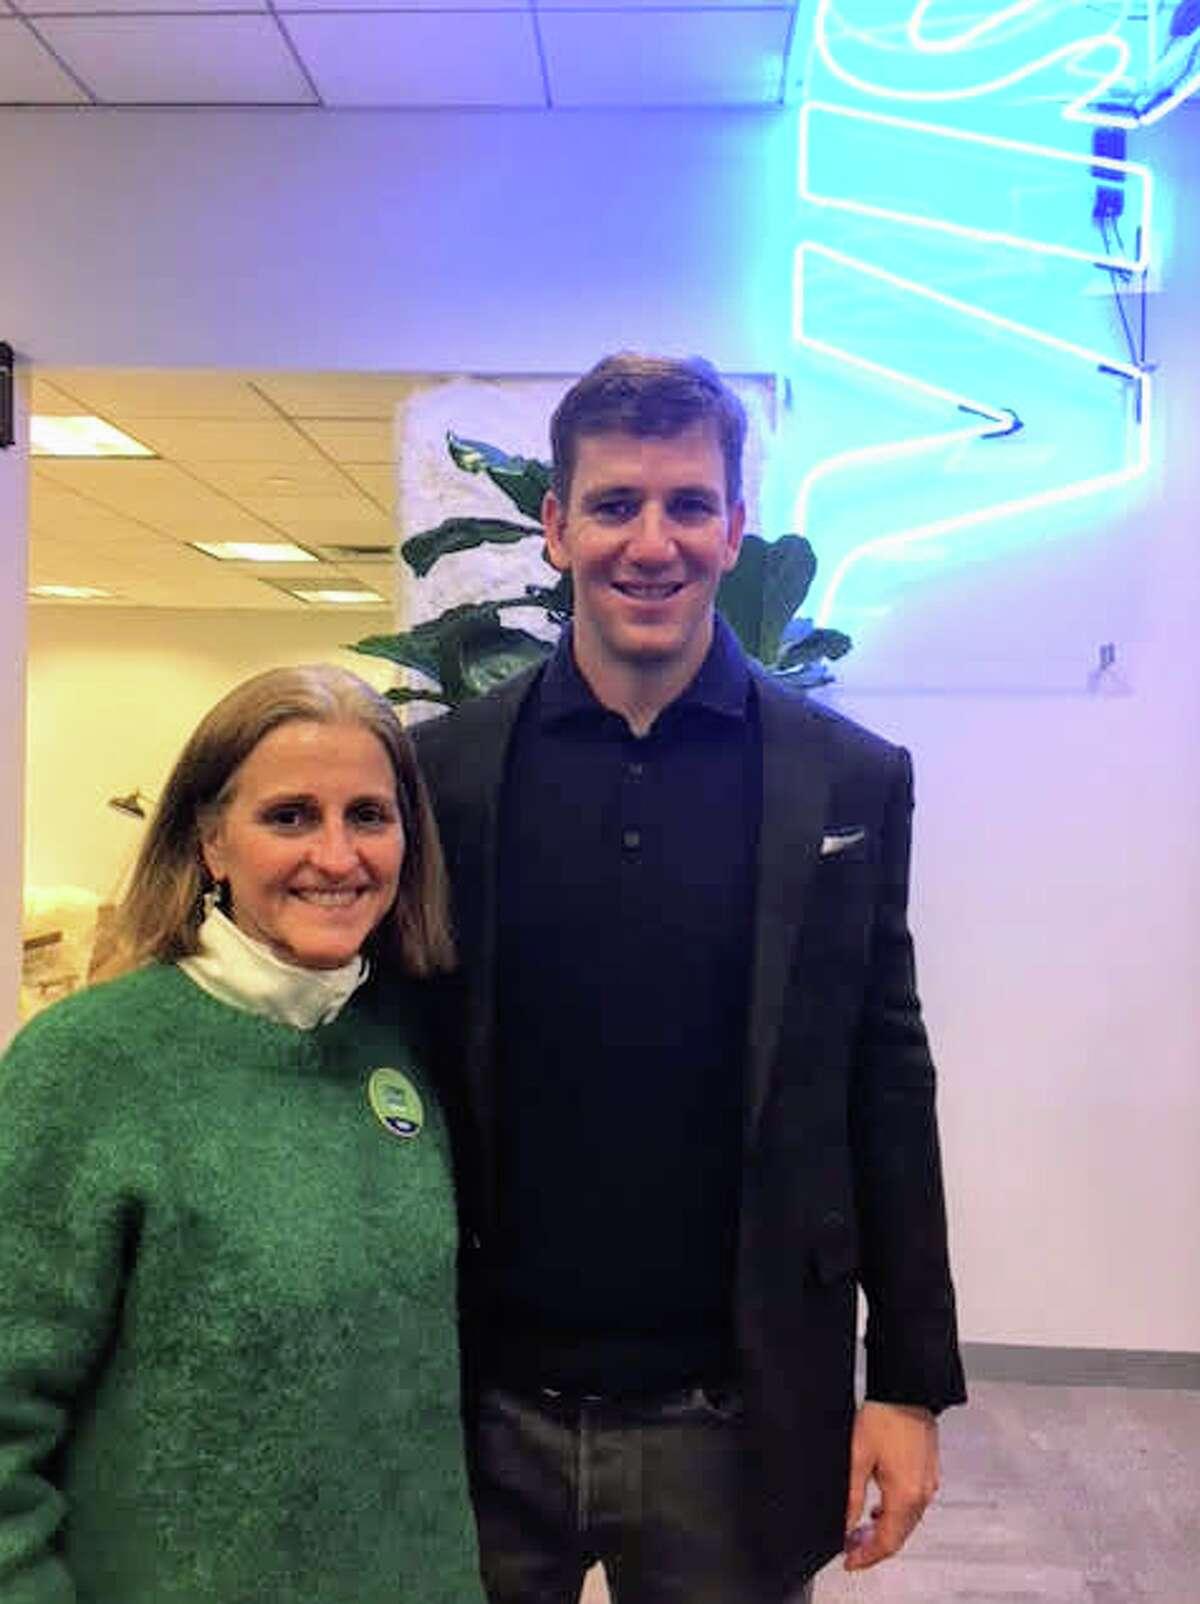 As part of Visa's sports sponsorhips, Biggar works with football stars like Eli Manning